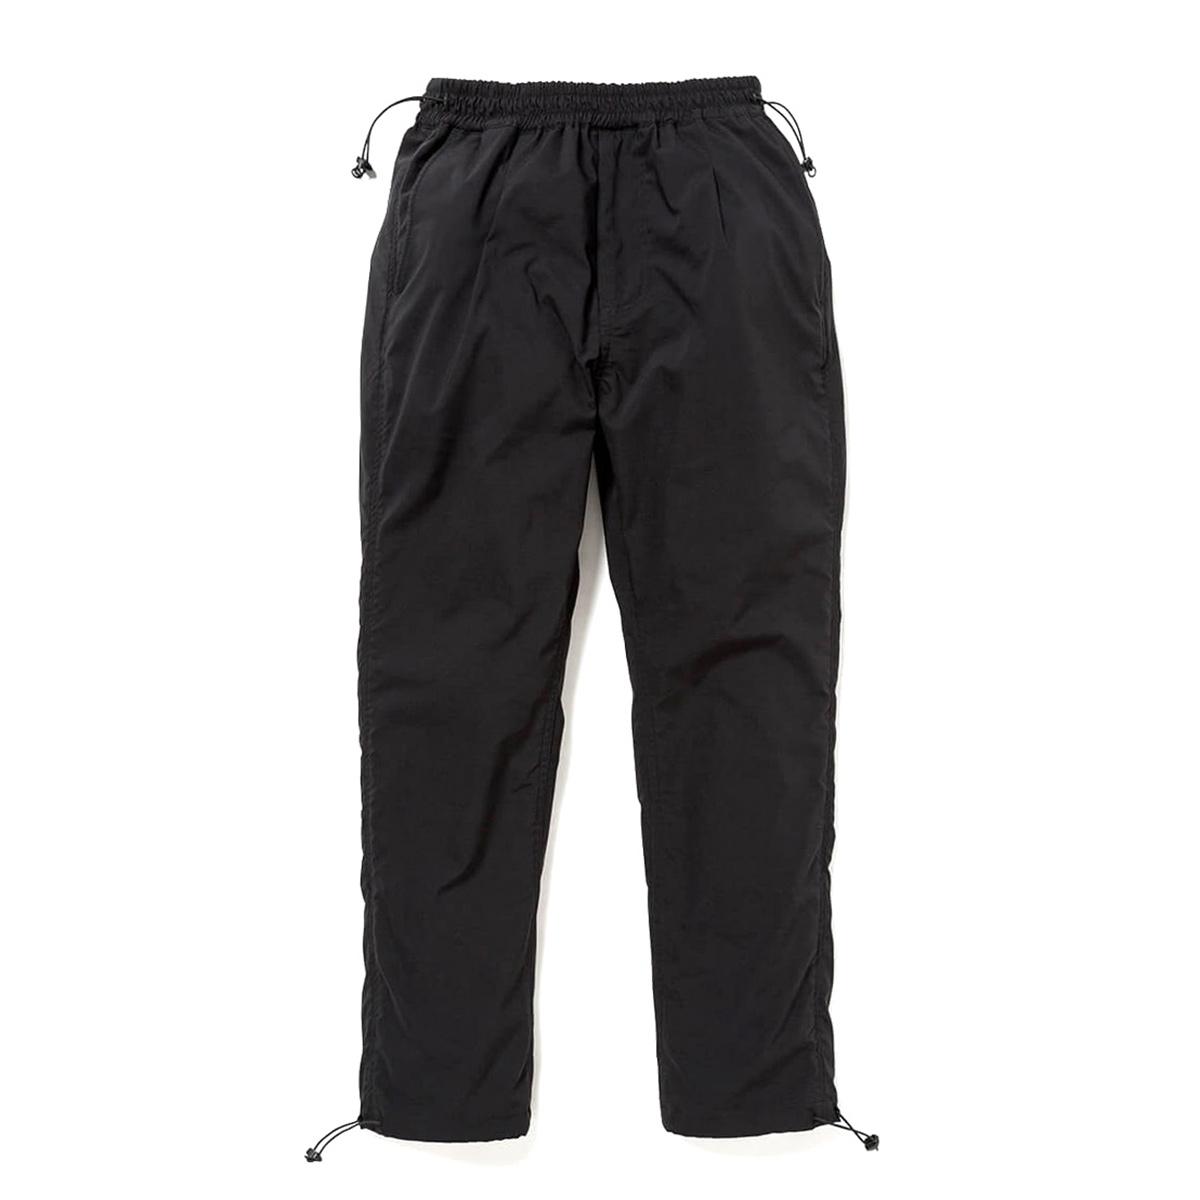 nonnative / TROOPER EASY PANTS POLY TWILL Pliantex® (Black)